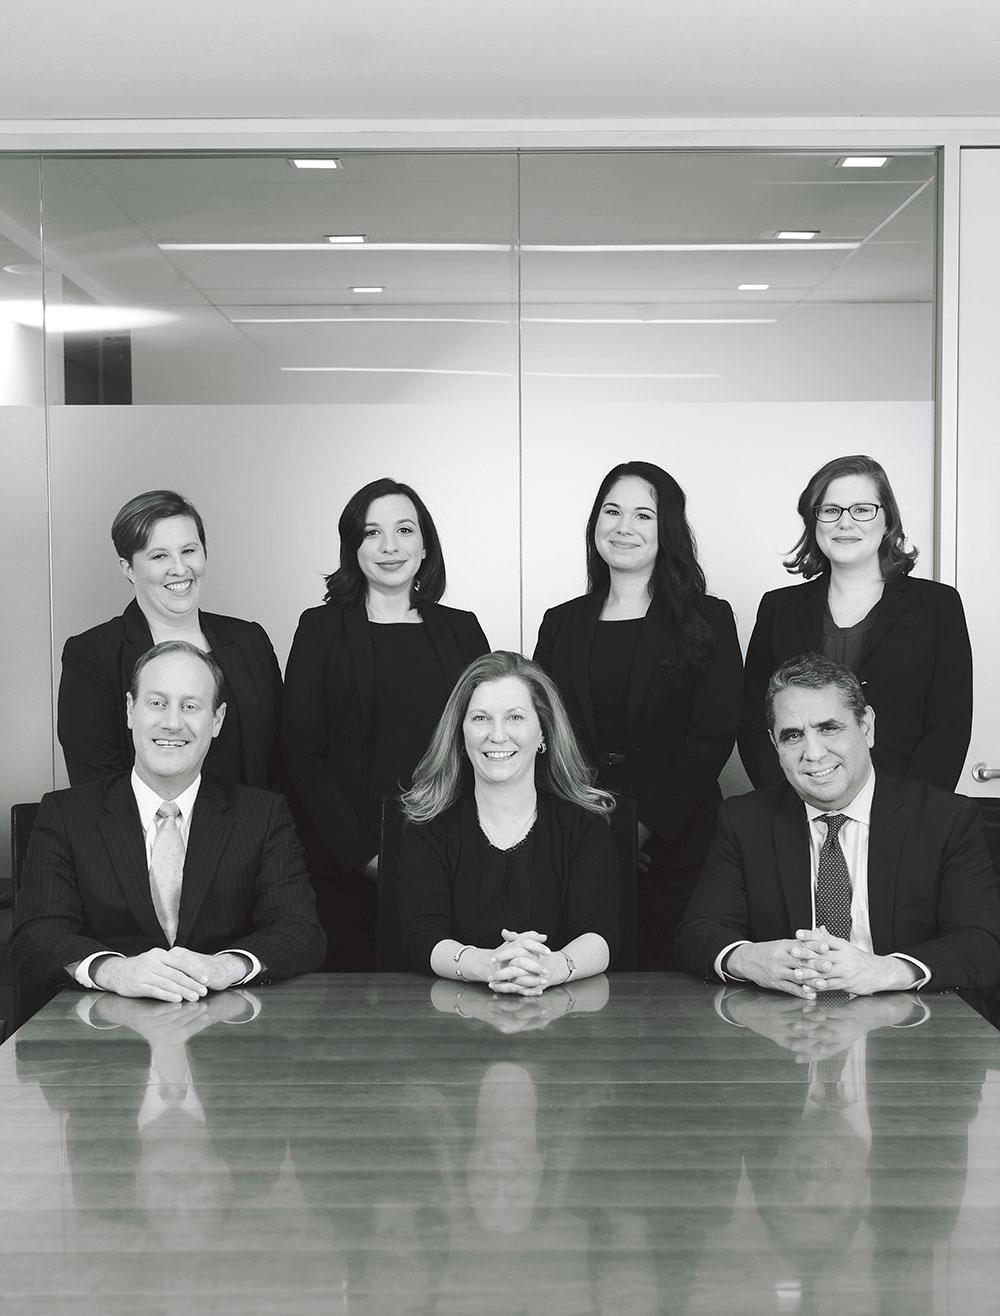 Outten & Golden LLP - Industry Leader in Employment Law